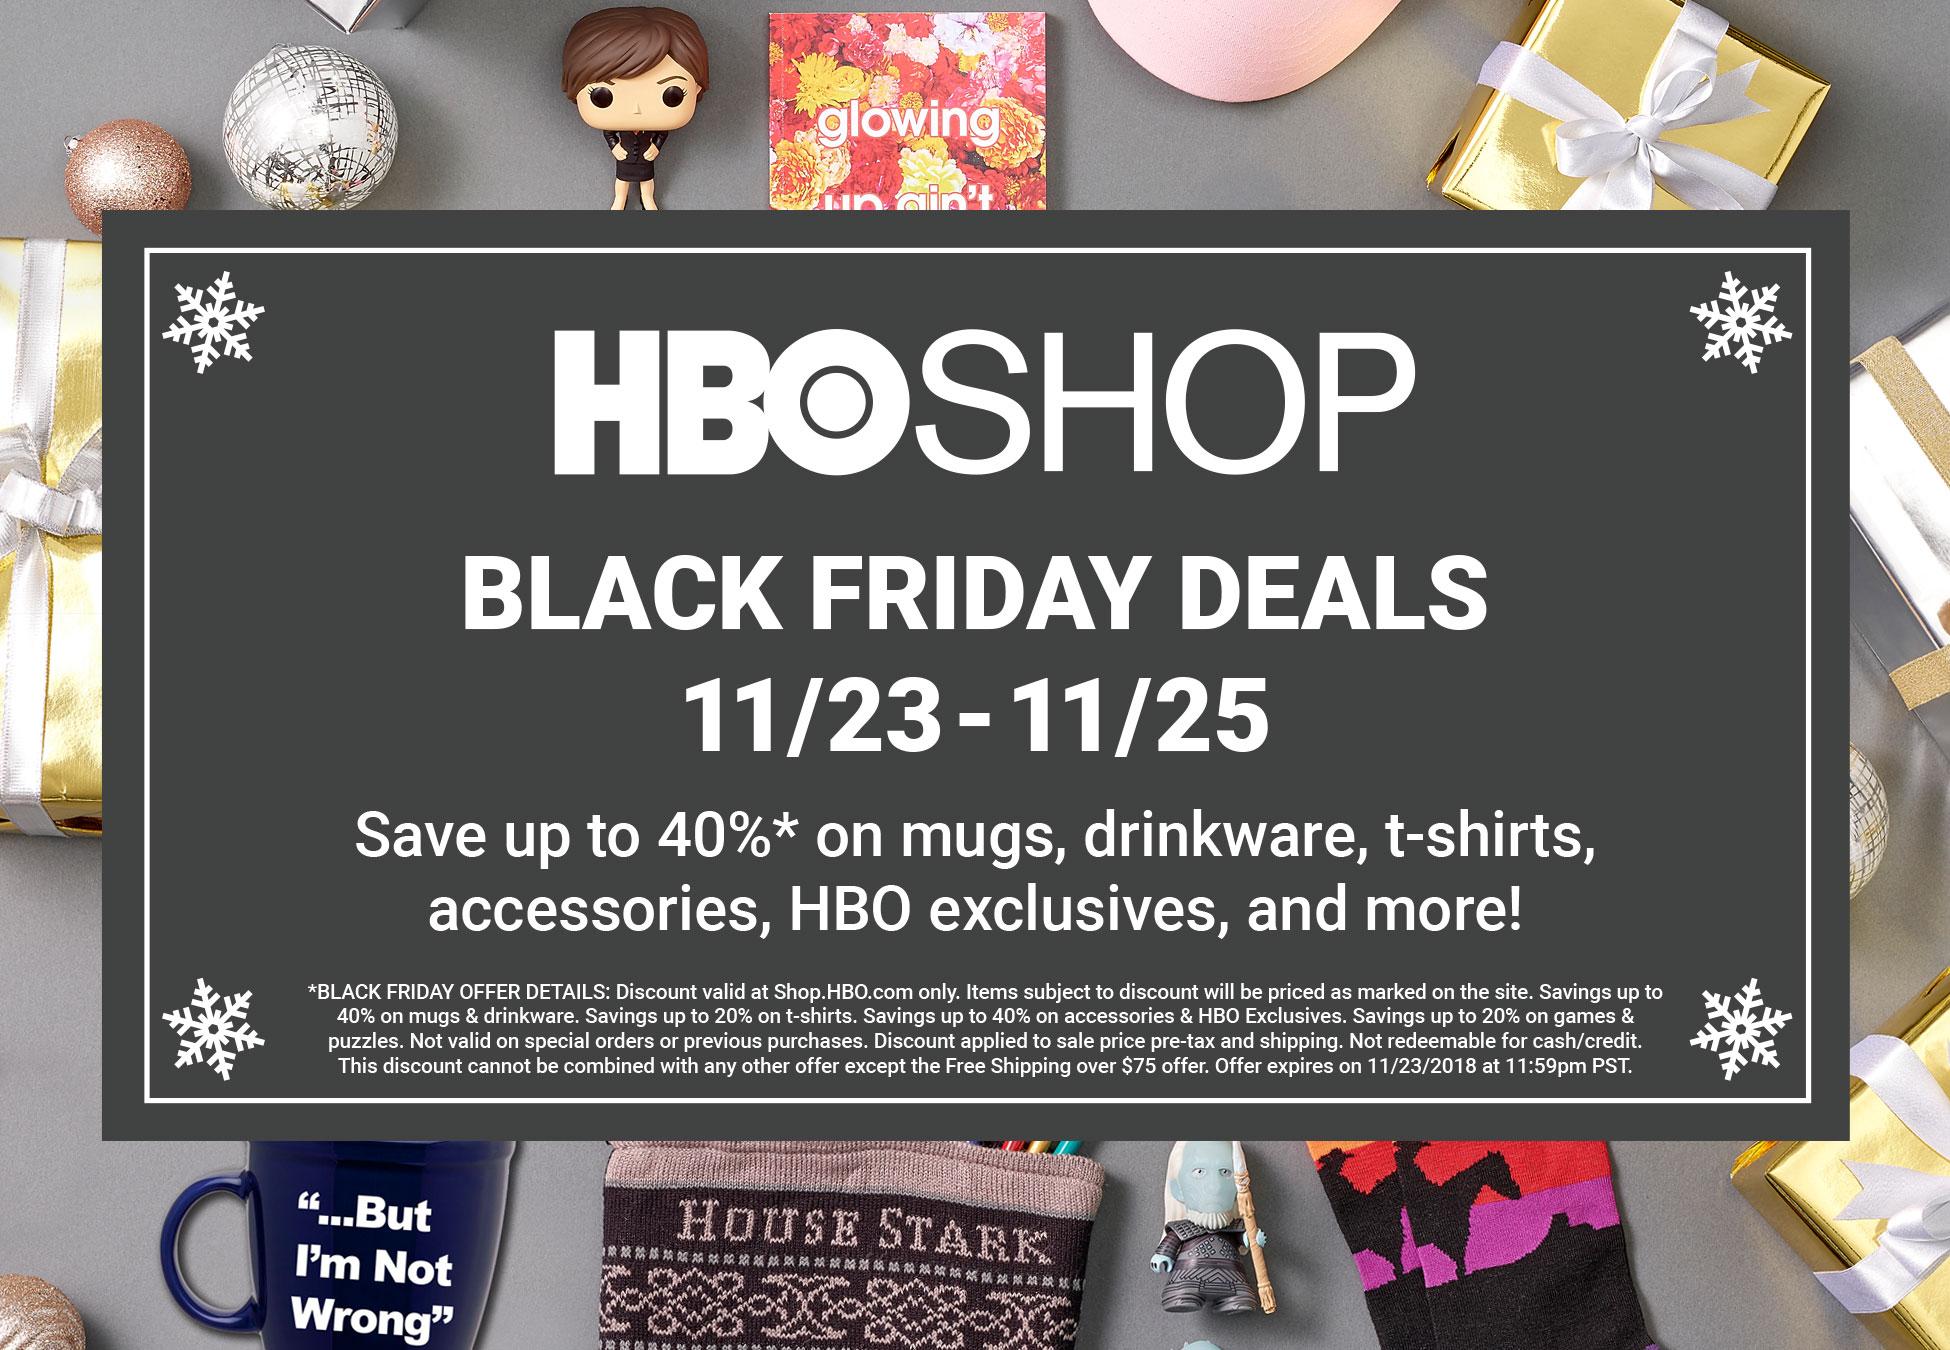 HBOShop-PR-Black-Friday-Deals (1)